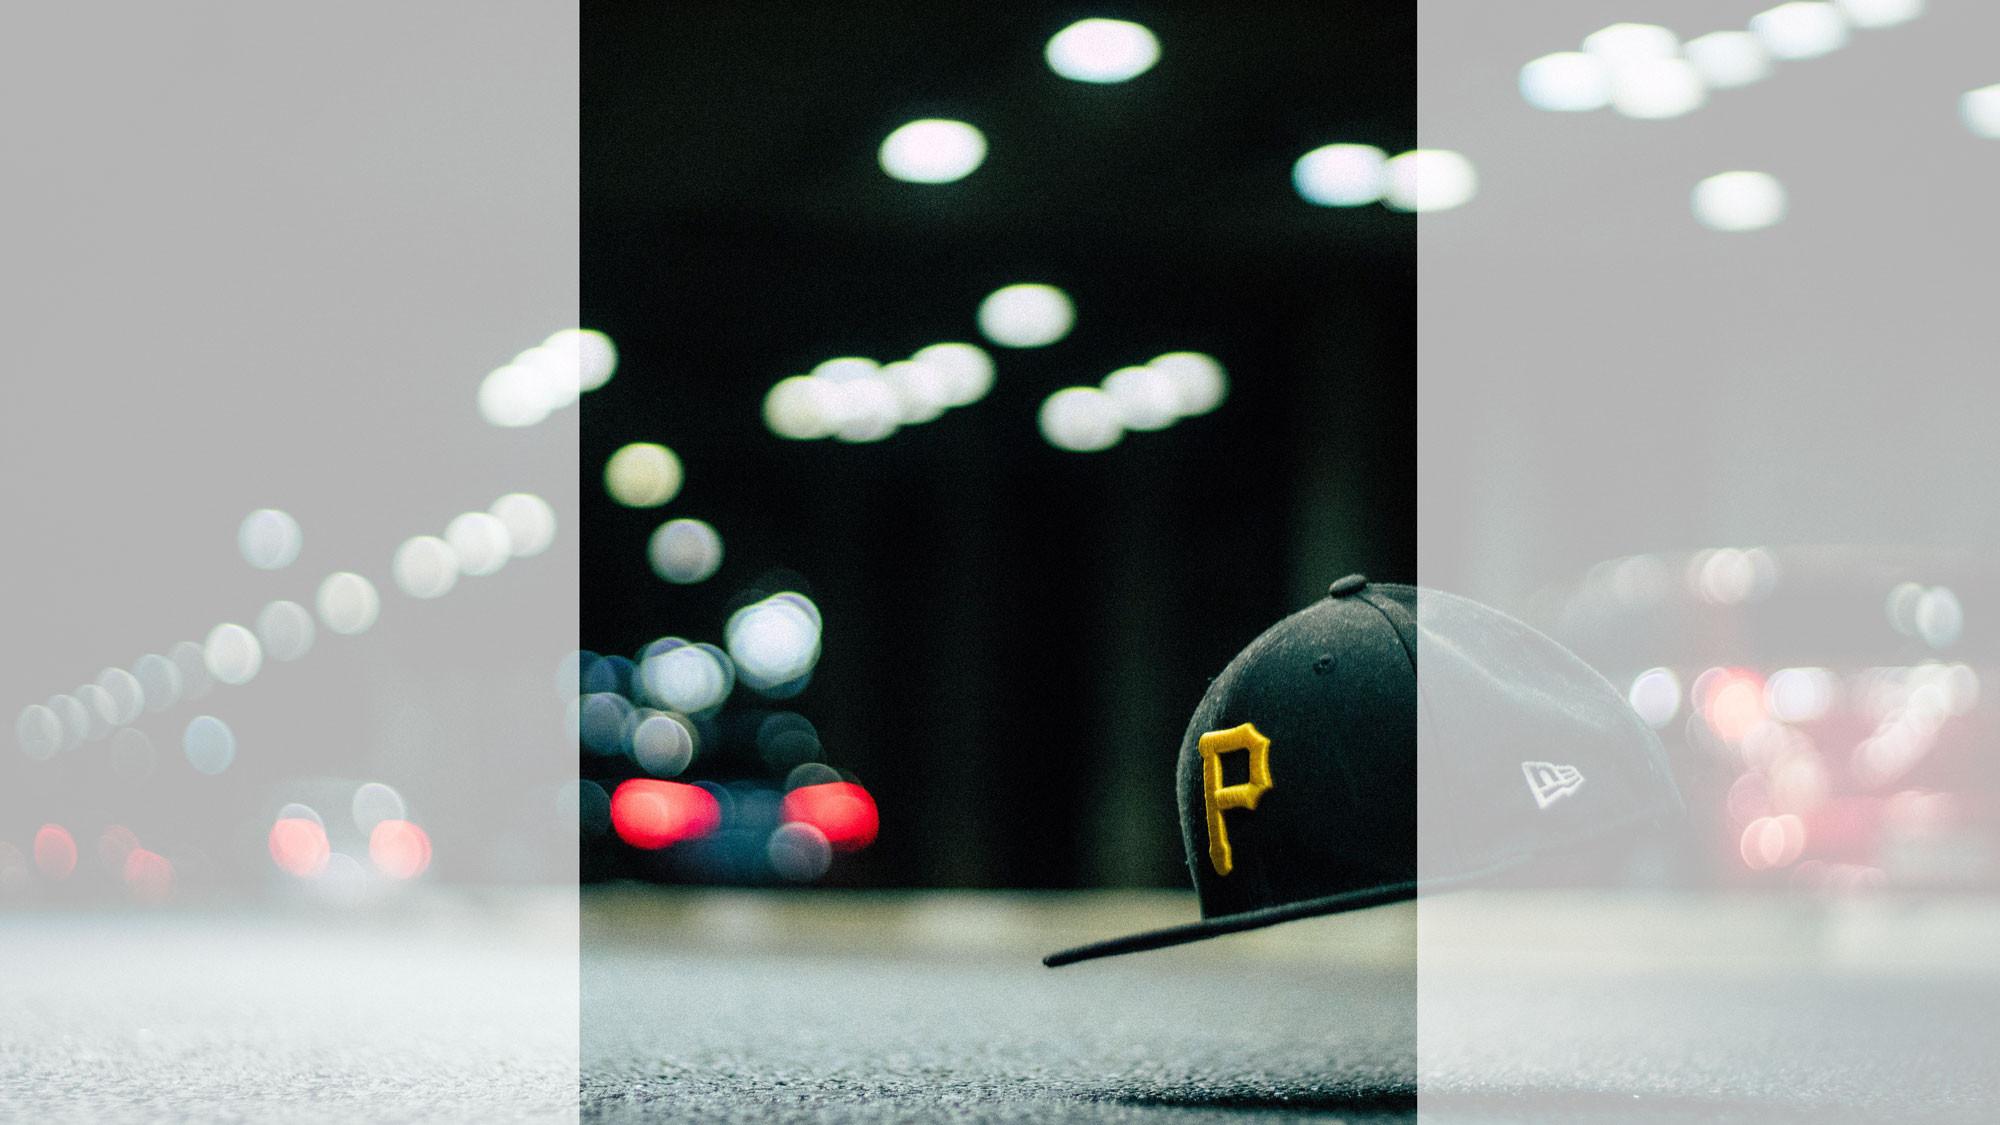 Standard-Bildausschnitt mit suboptimalem Fokus